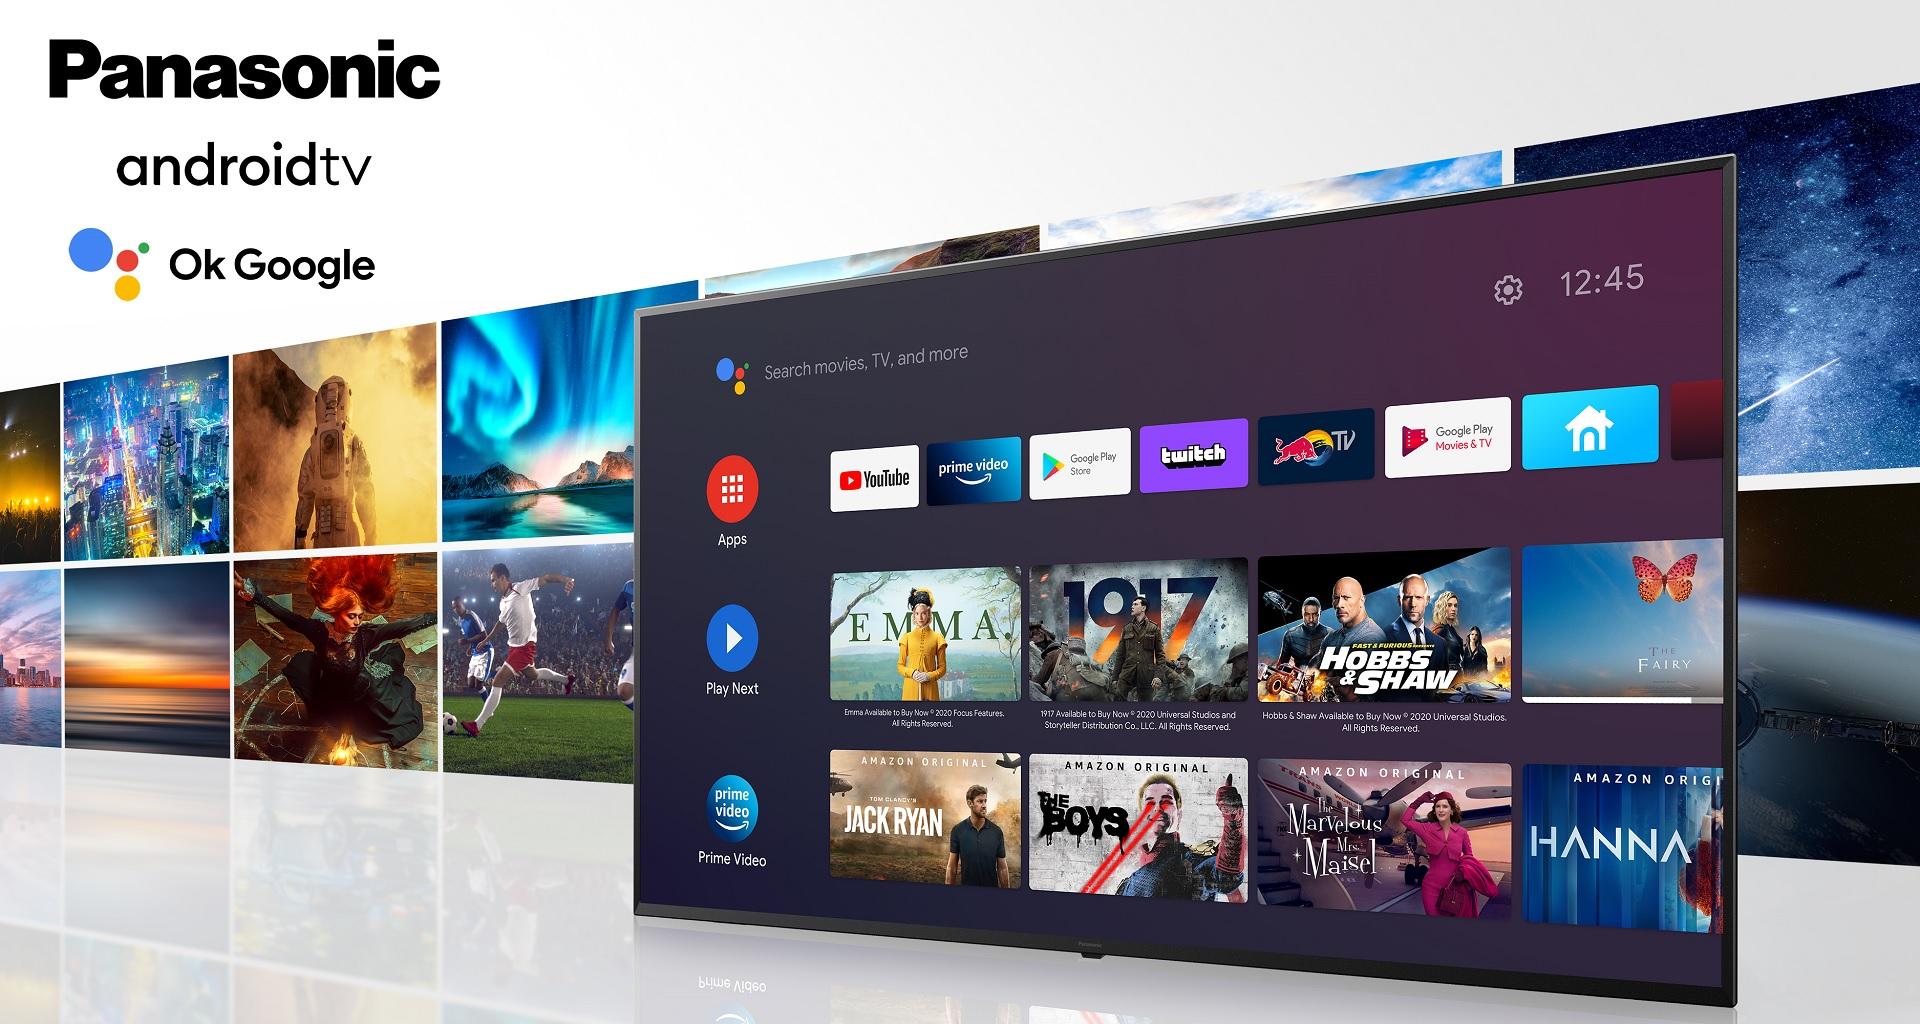 Panasonic Android TV